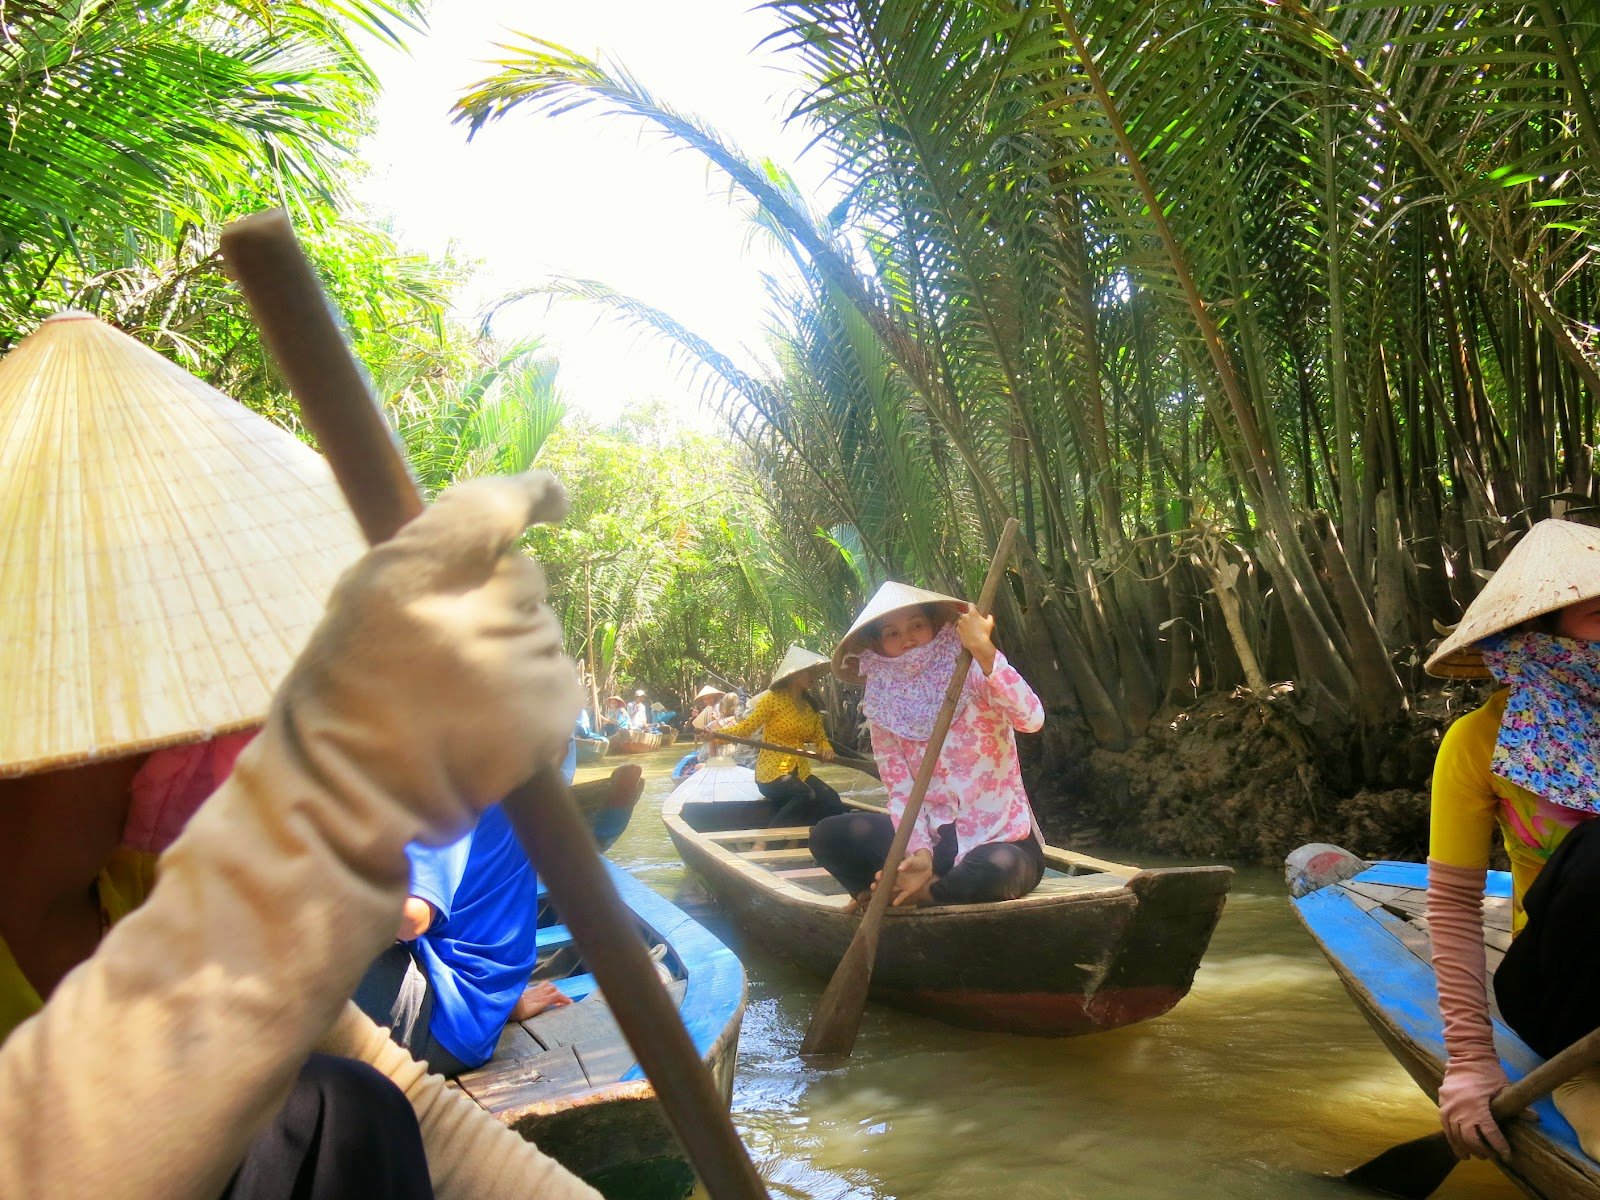 Mekong-deltat, vietnam